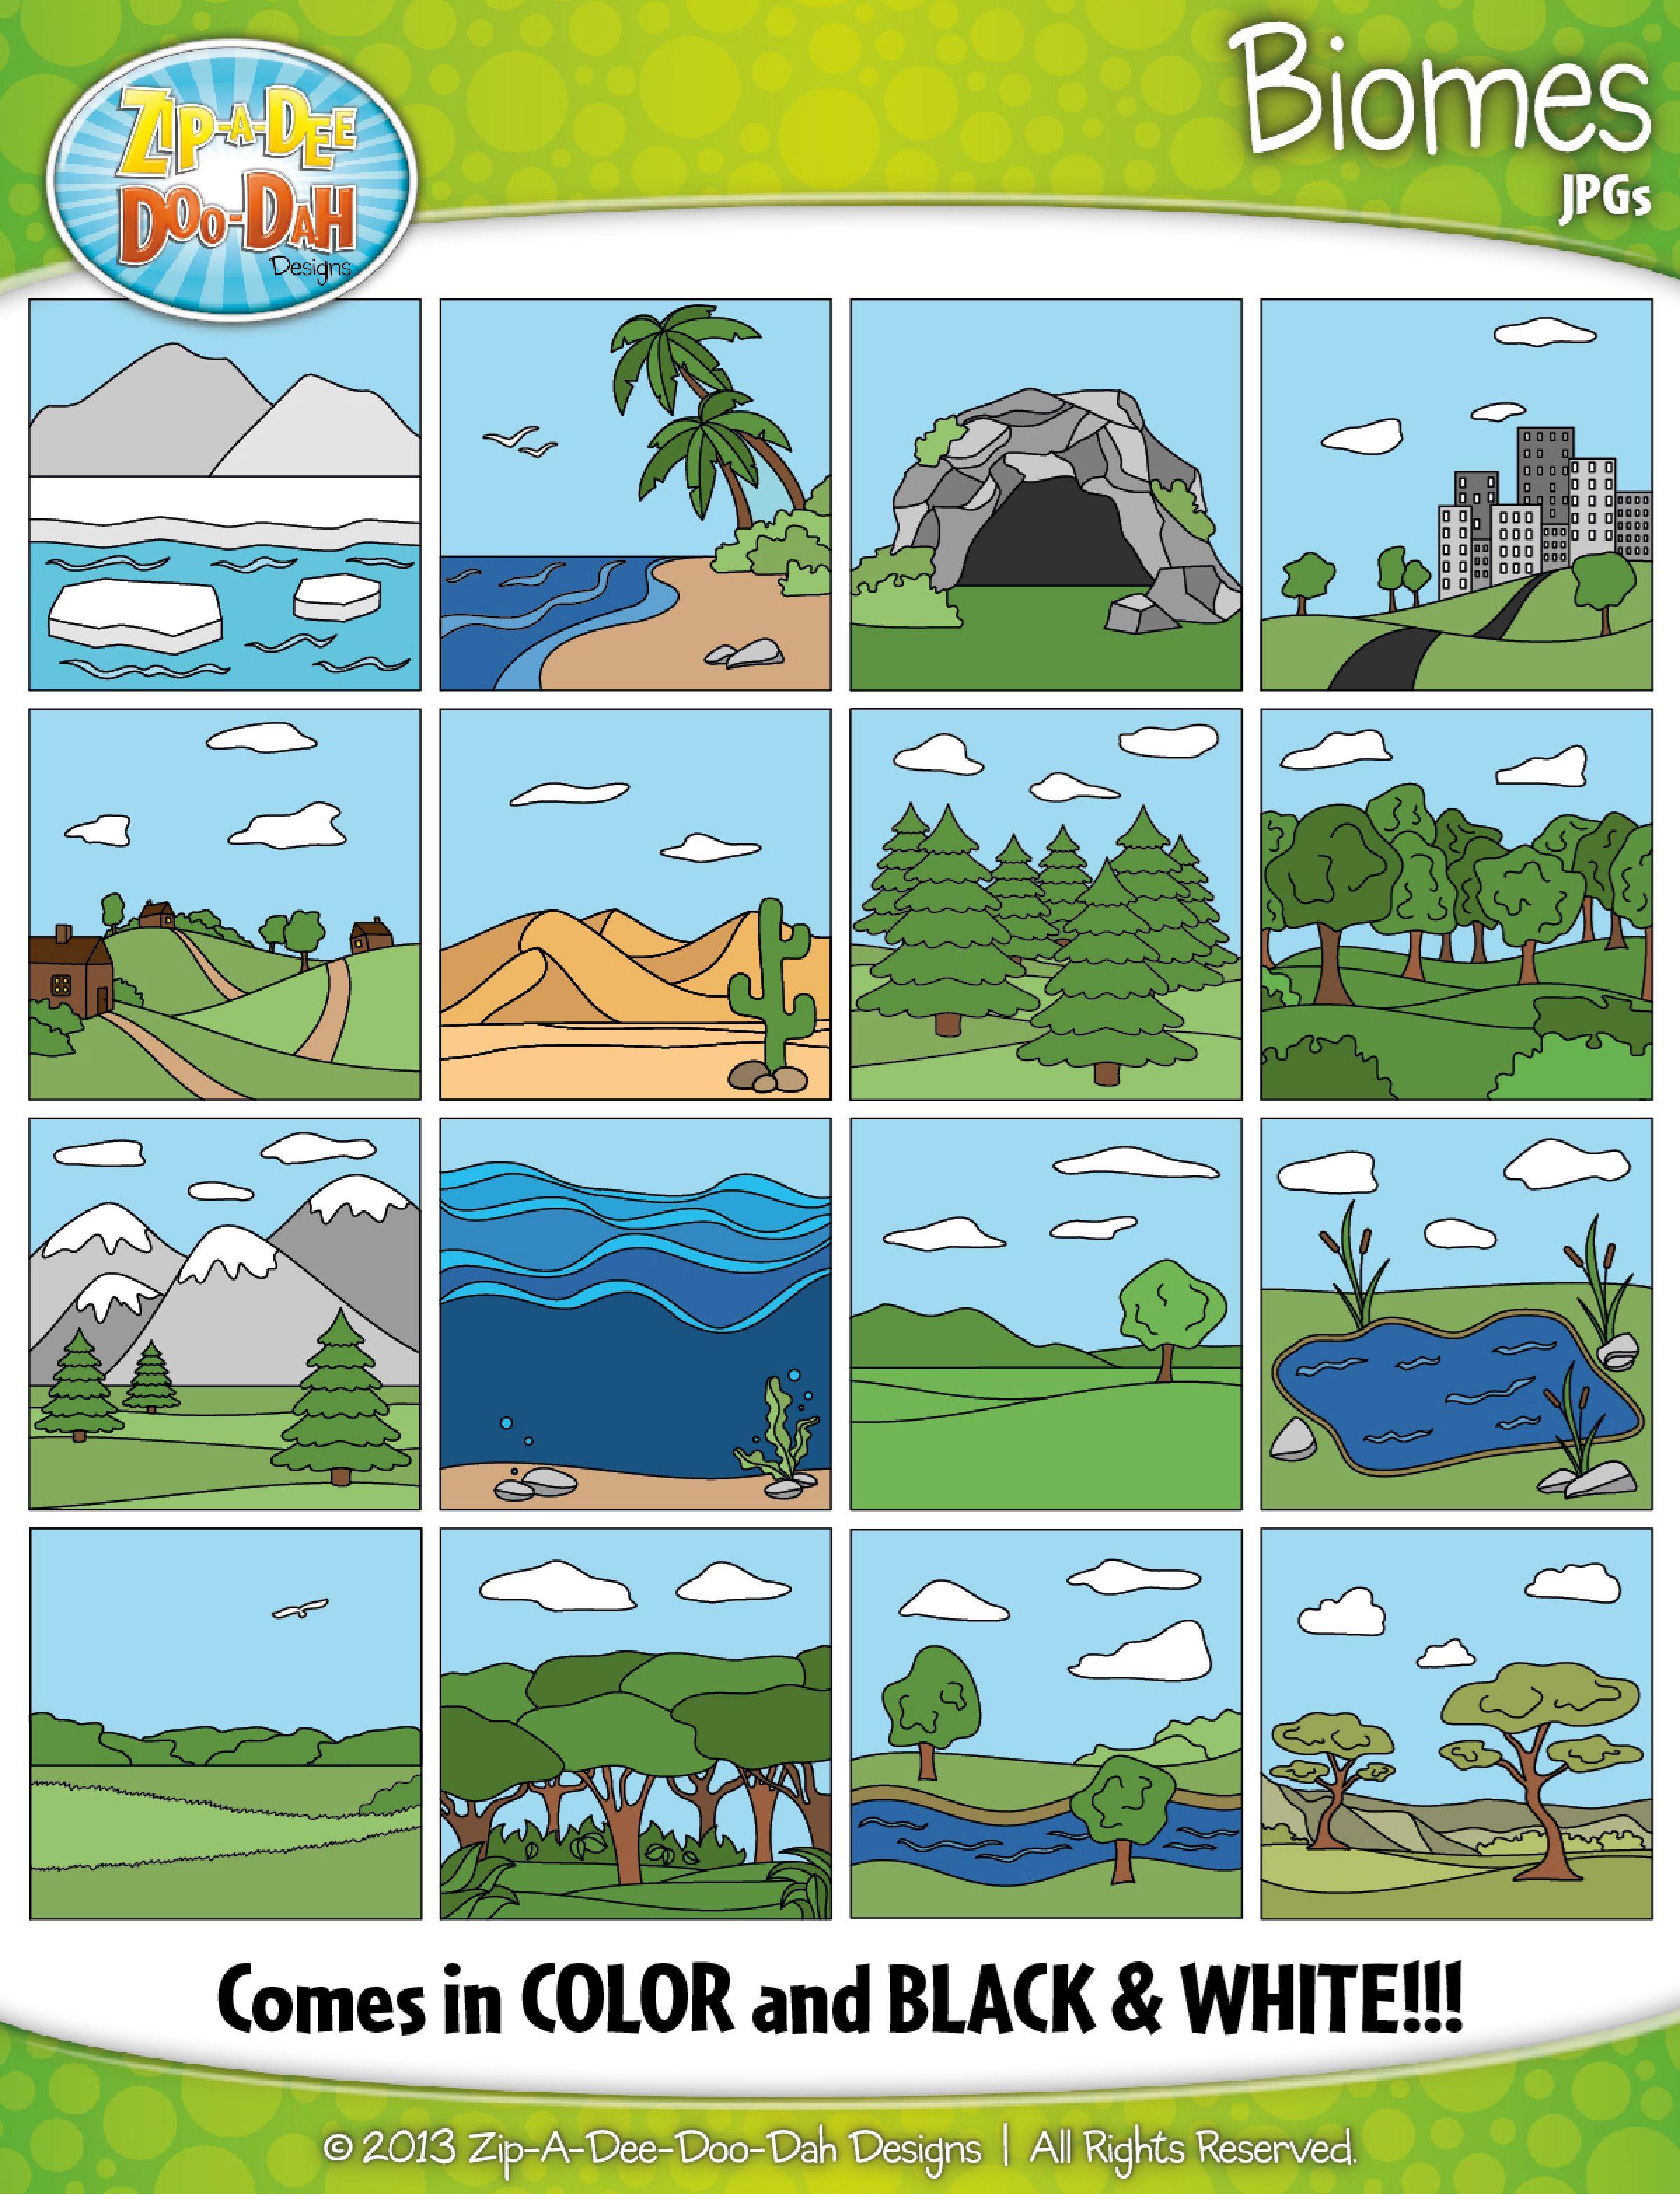 Biomes Ecosystems Clipart Zip A Dee Doo Dah Designs